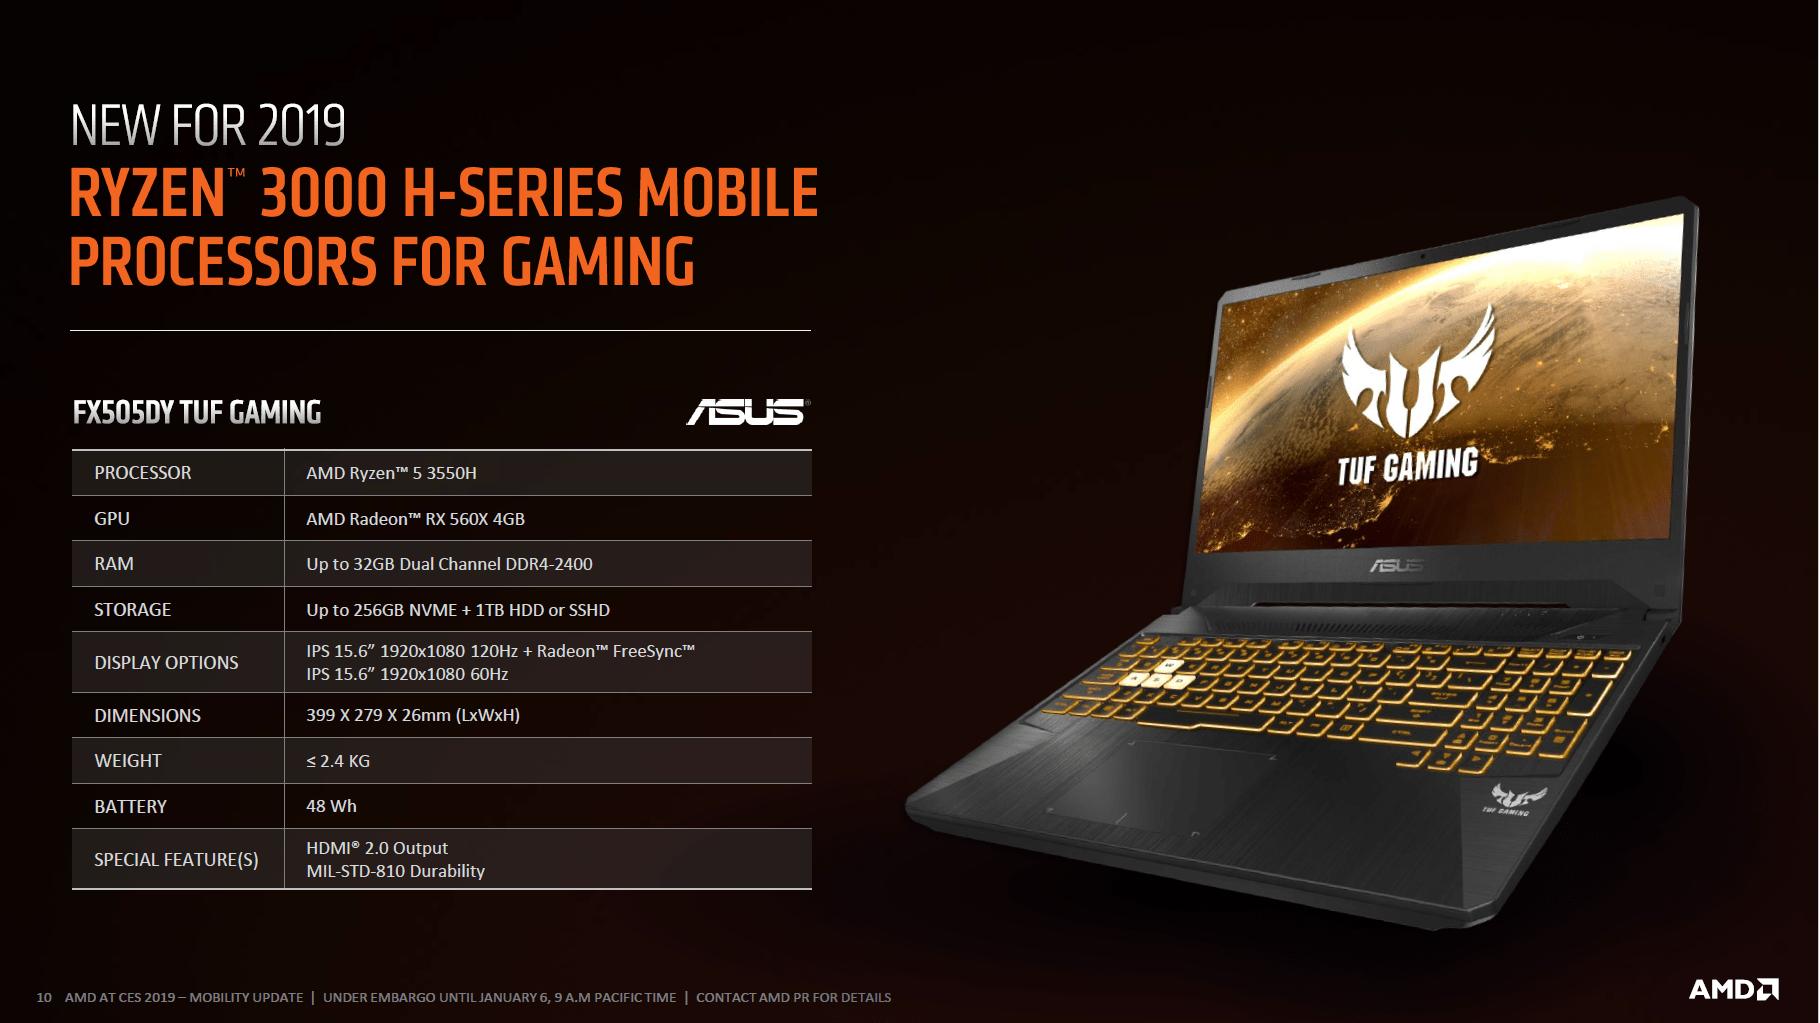 Asus FX505DY Tuf Gaming